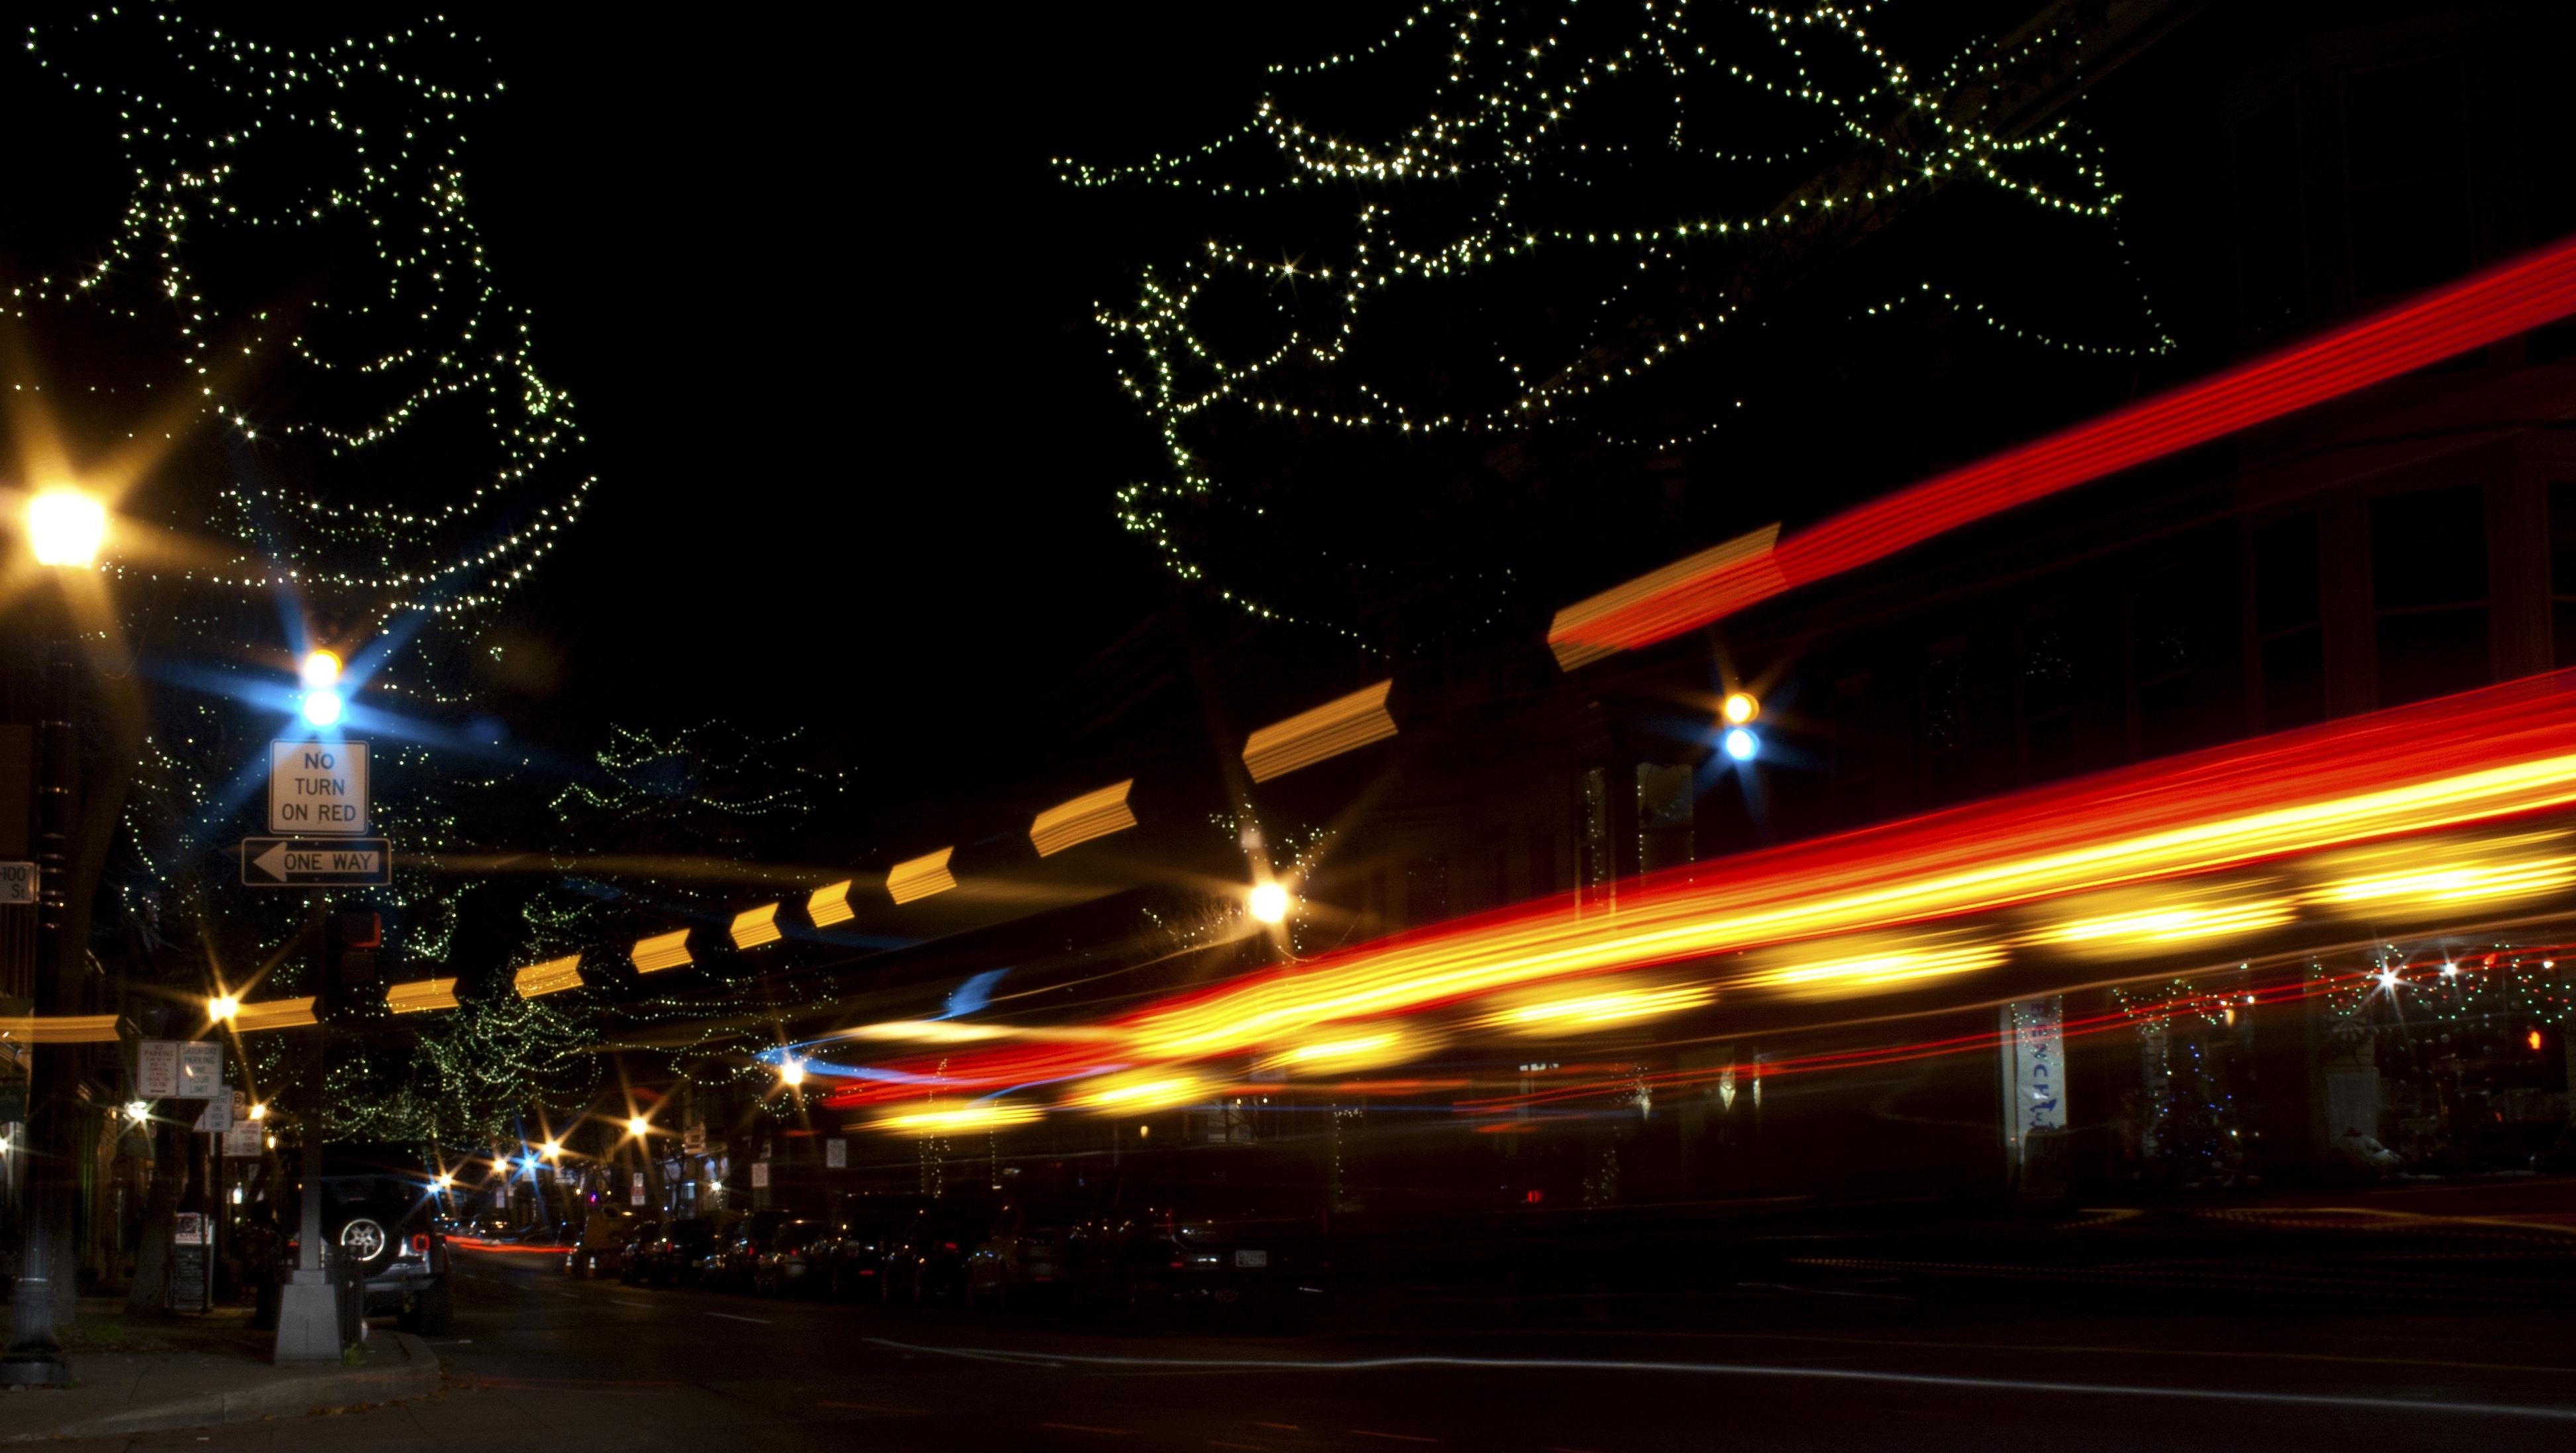 Fotos Gratis Ligero Difuminar Abstracto Arquitectura Noche